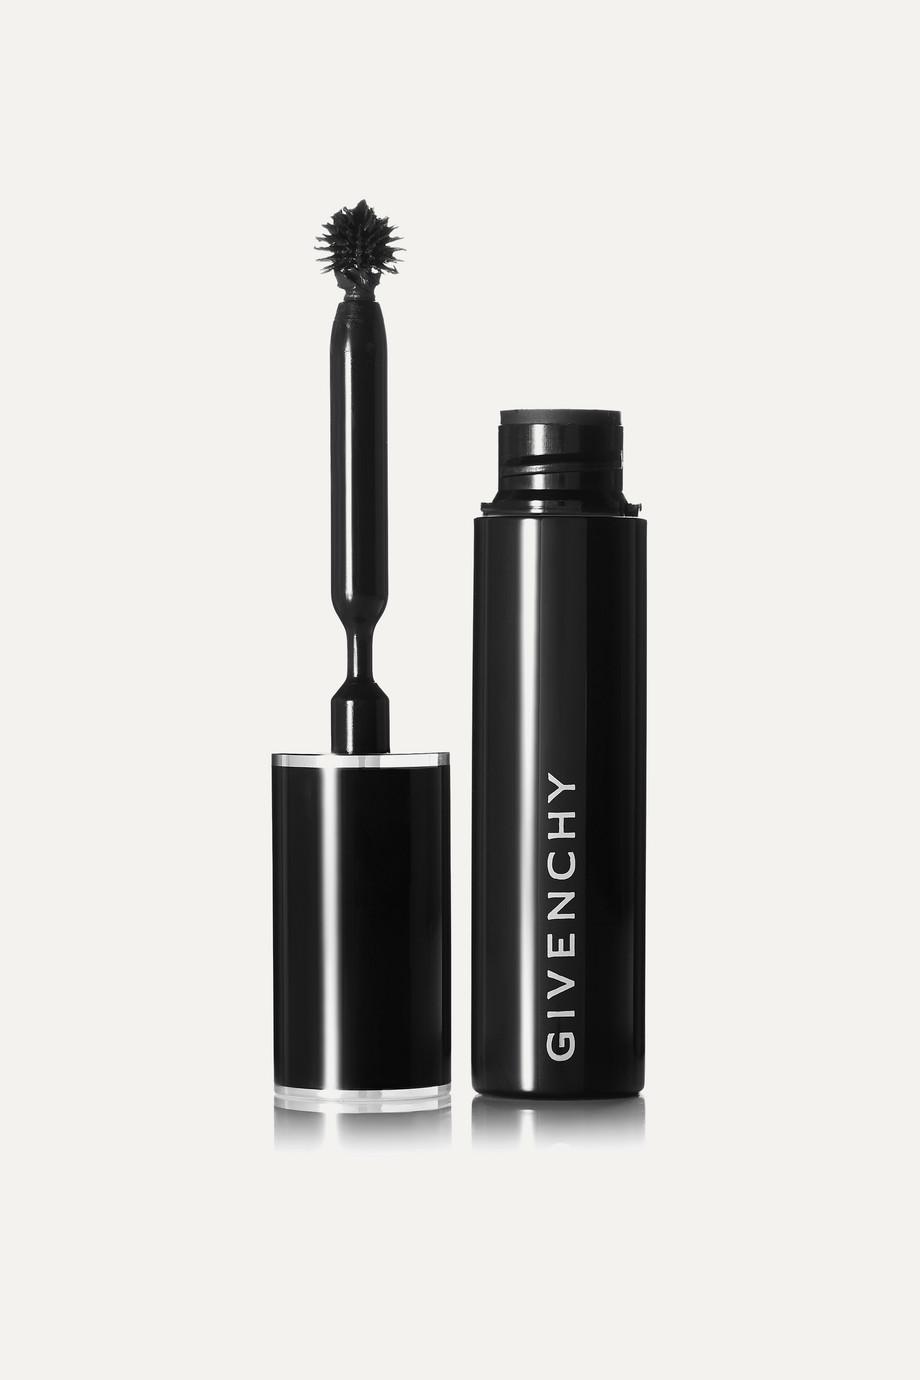 Givenchy Beauty Phenomen'Eyes Mascara - Phenomen'Black 1